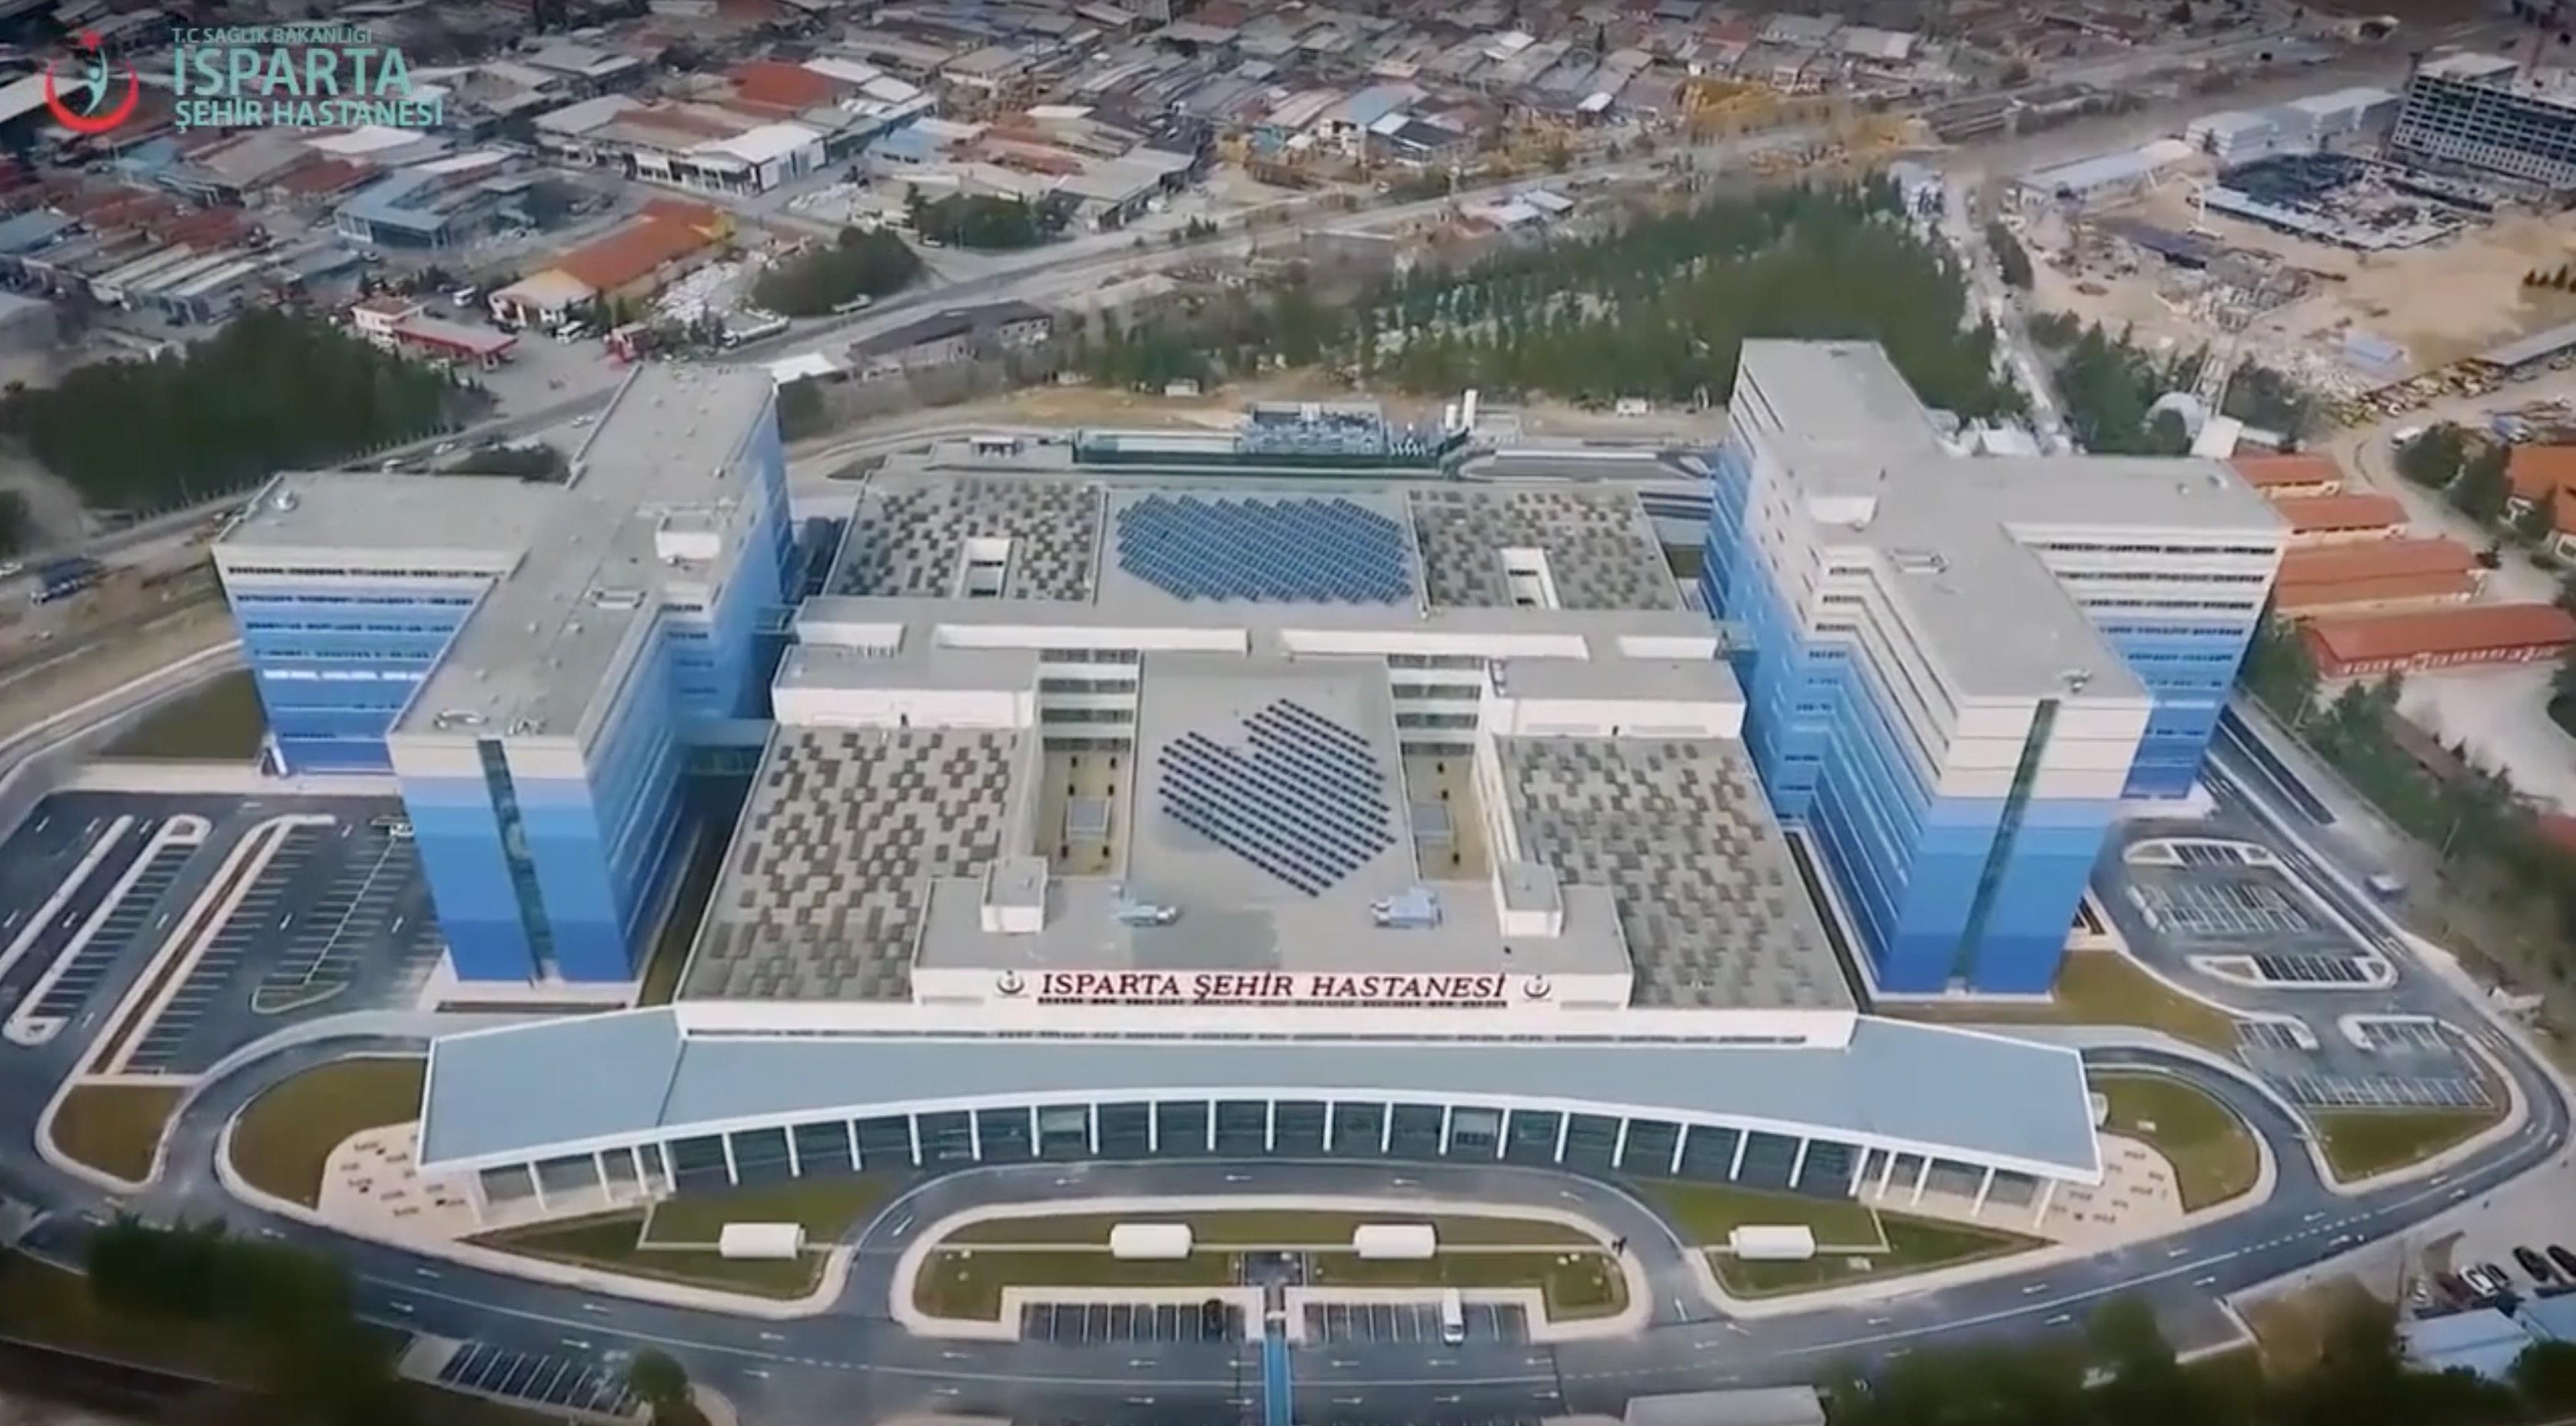 Isparta Şehir Hastanesi Tanıtım Filmi